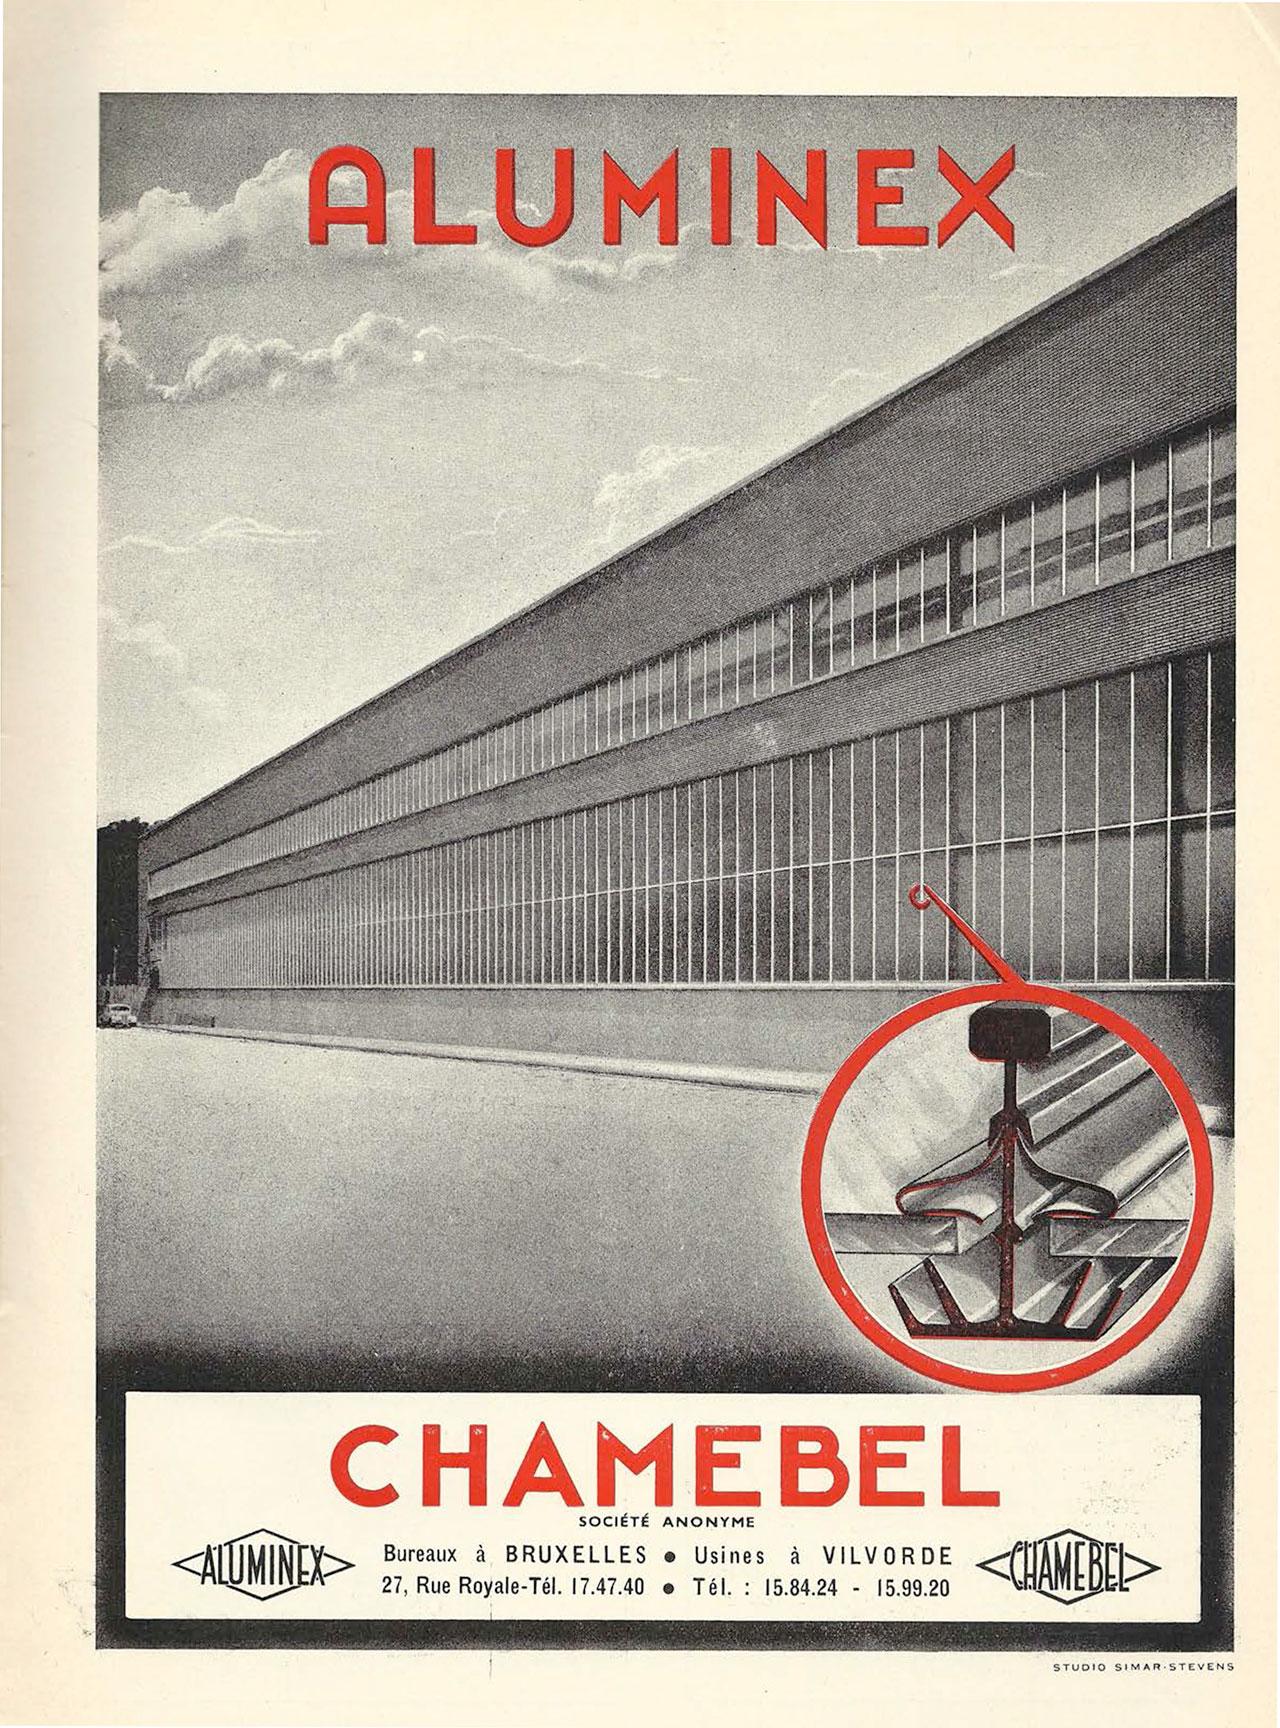 Aluminex